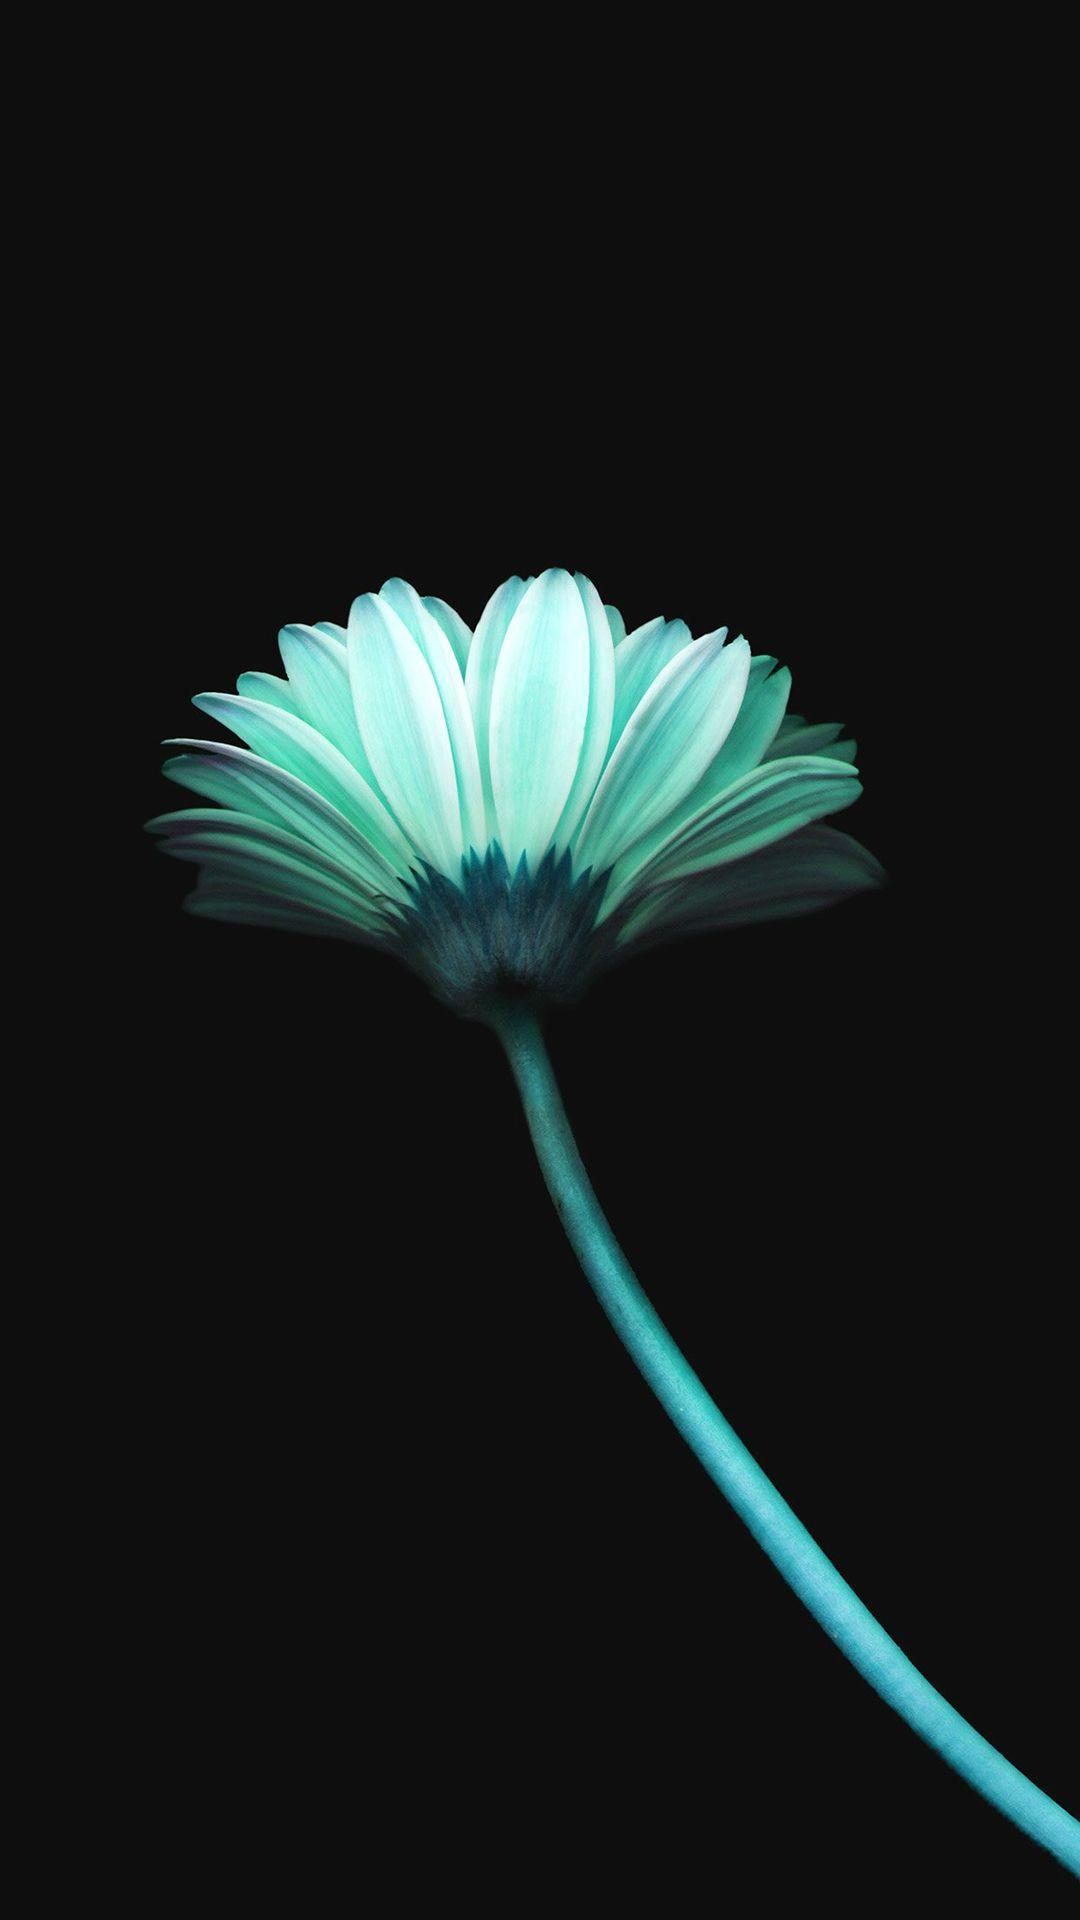 Lonely Flower Dark Blue Simple Minimal Art IPhone 7 Wallpaper